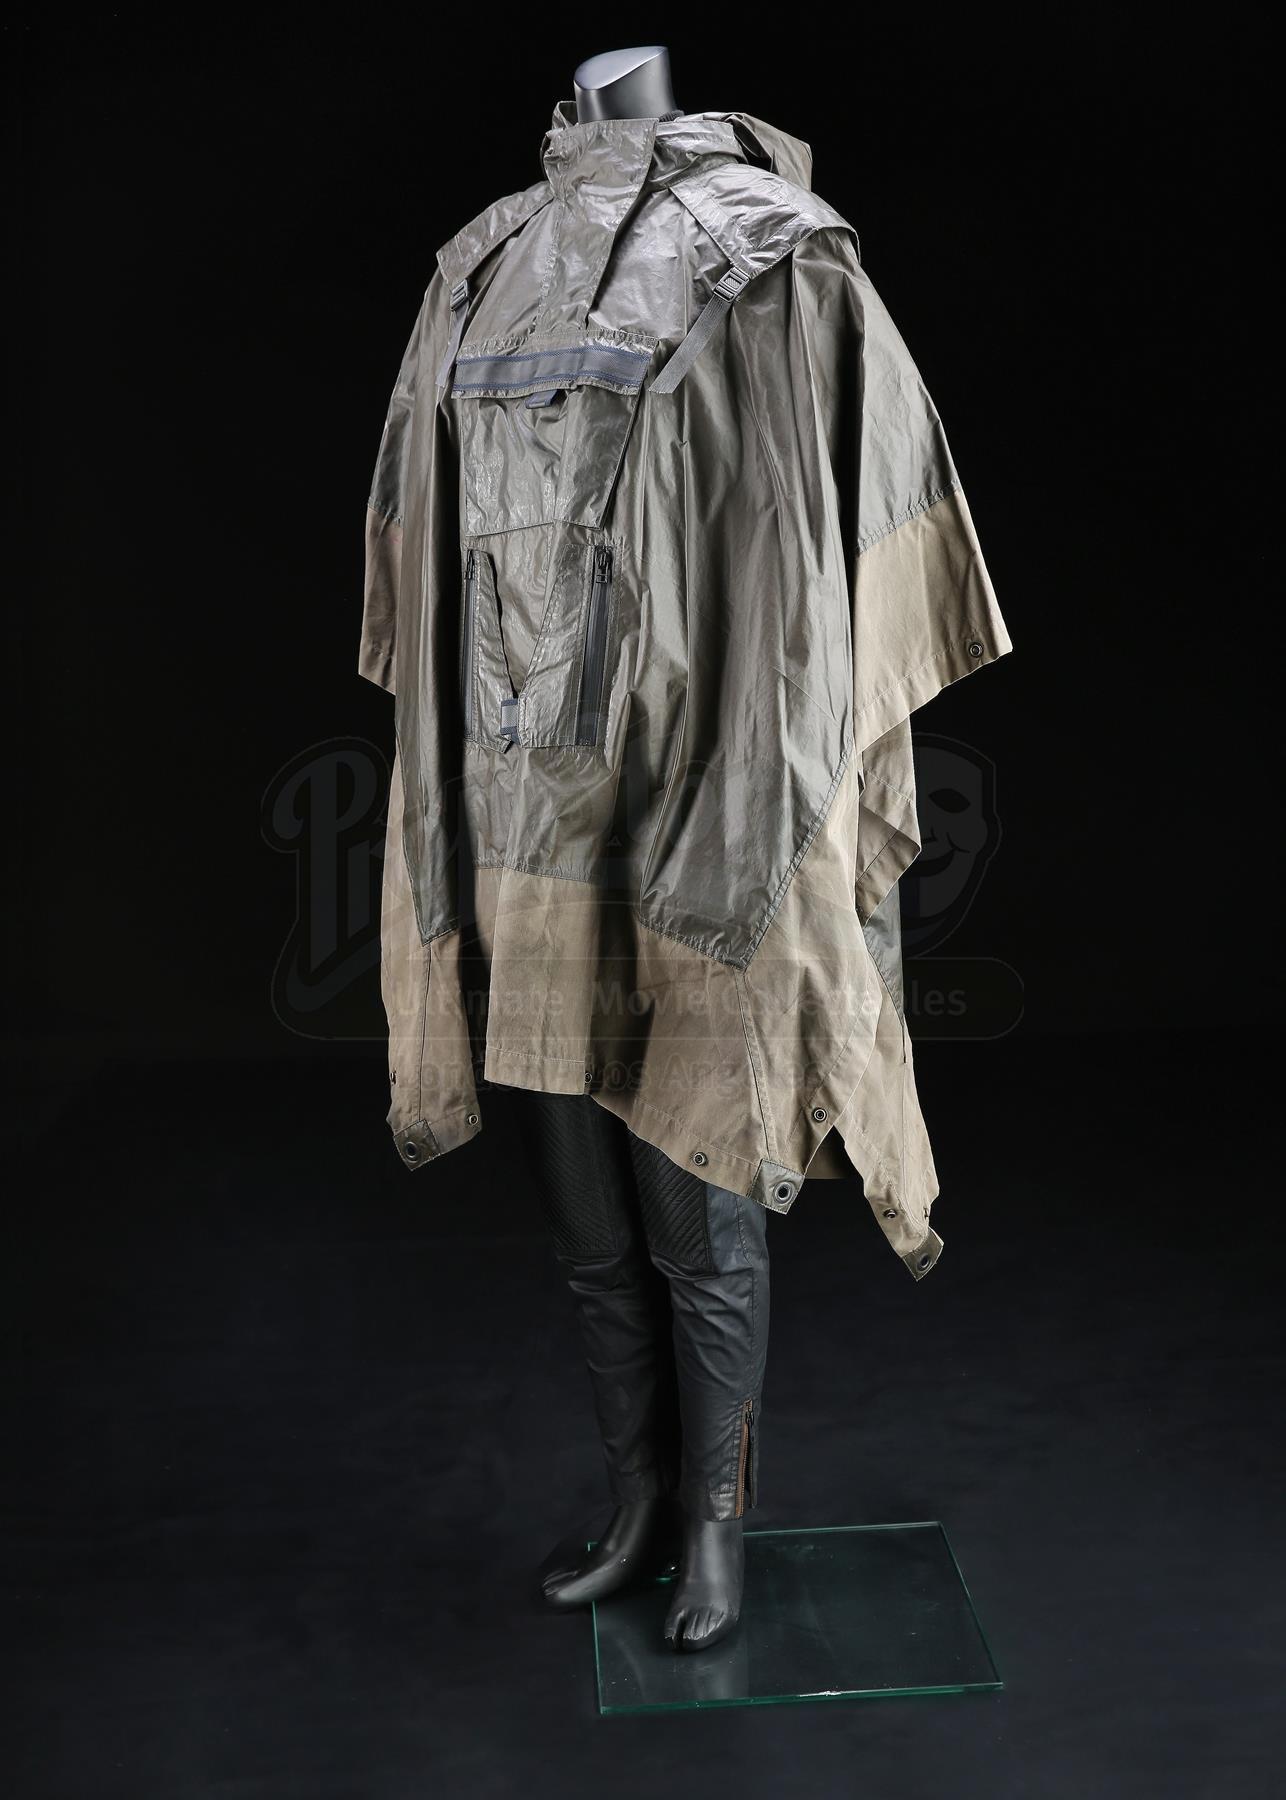 Major S Scarlett Johansson Cemetery Costume Current Price 2200